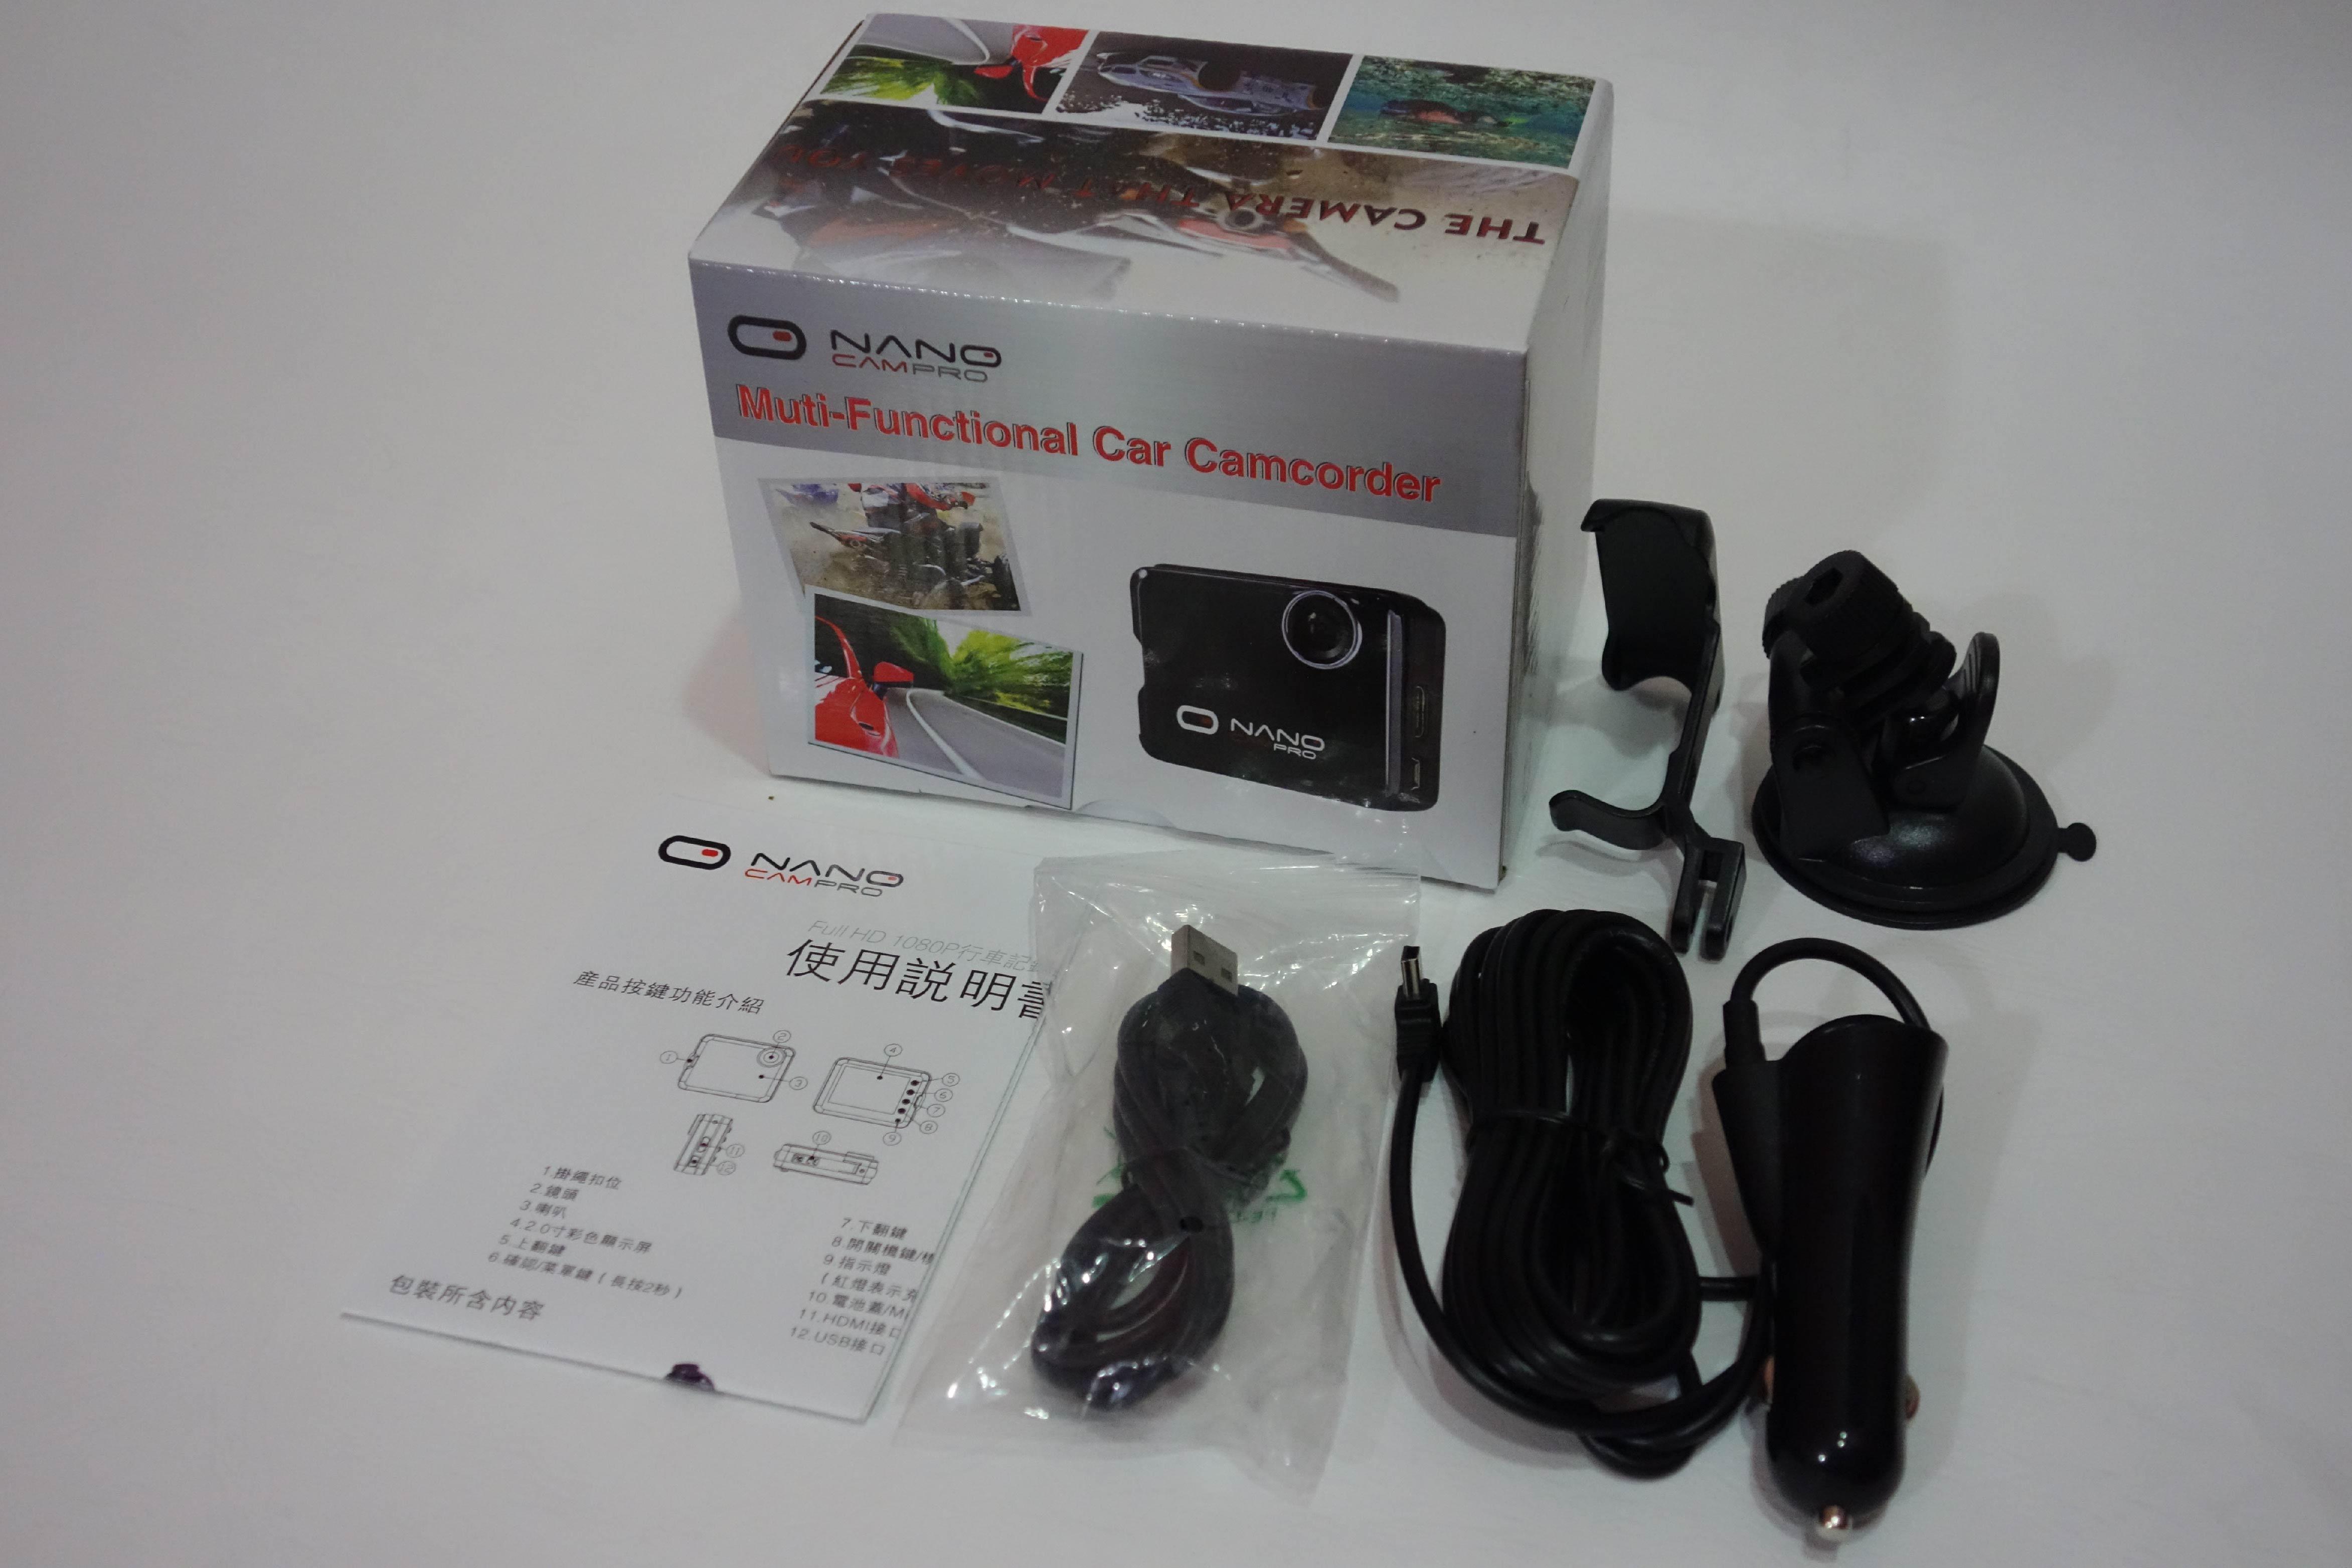 ELK-美商NANO CAMPRO T3頂級版行車紀錄器 1080P FULL HD超強夜拍王 採用聯詠96650夜視處理晶片(保固詳情請參閱商品描述) 2